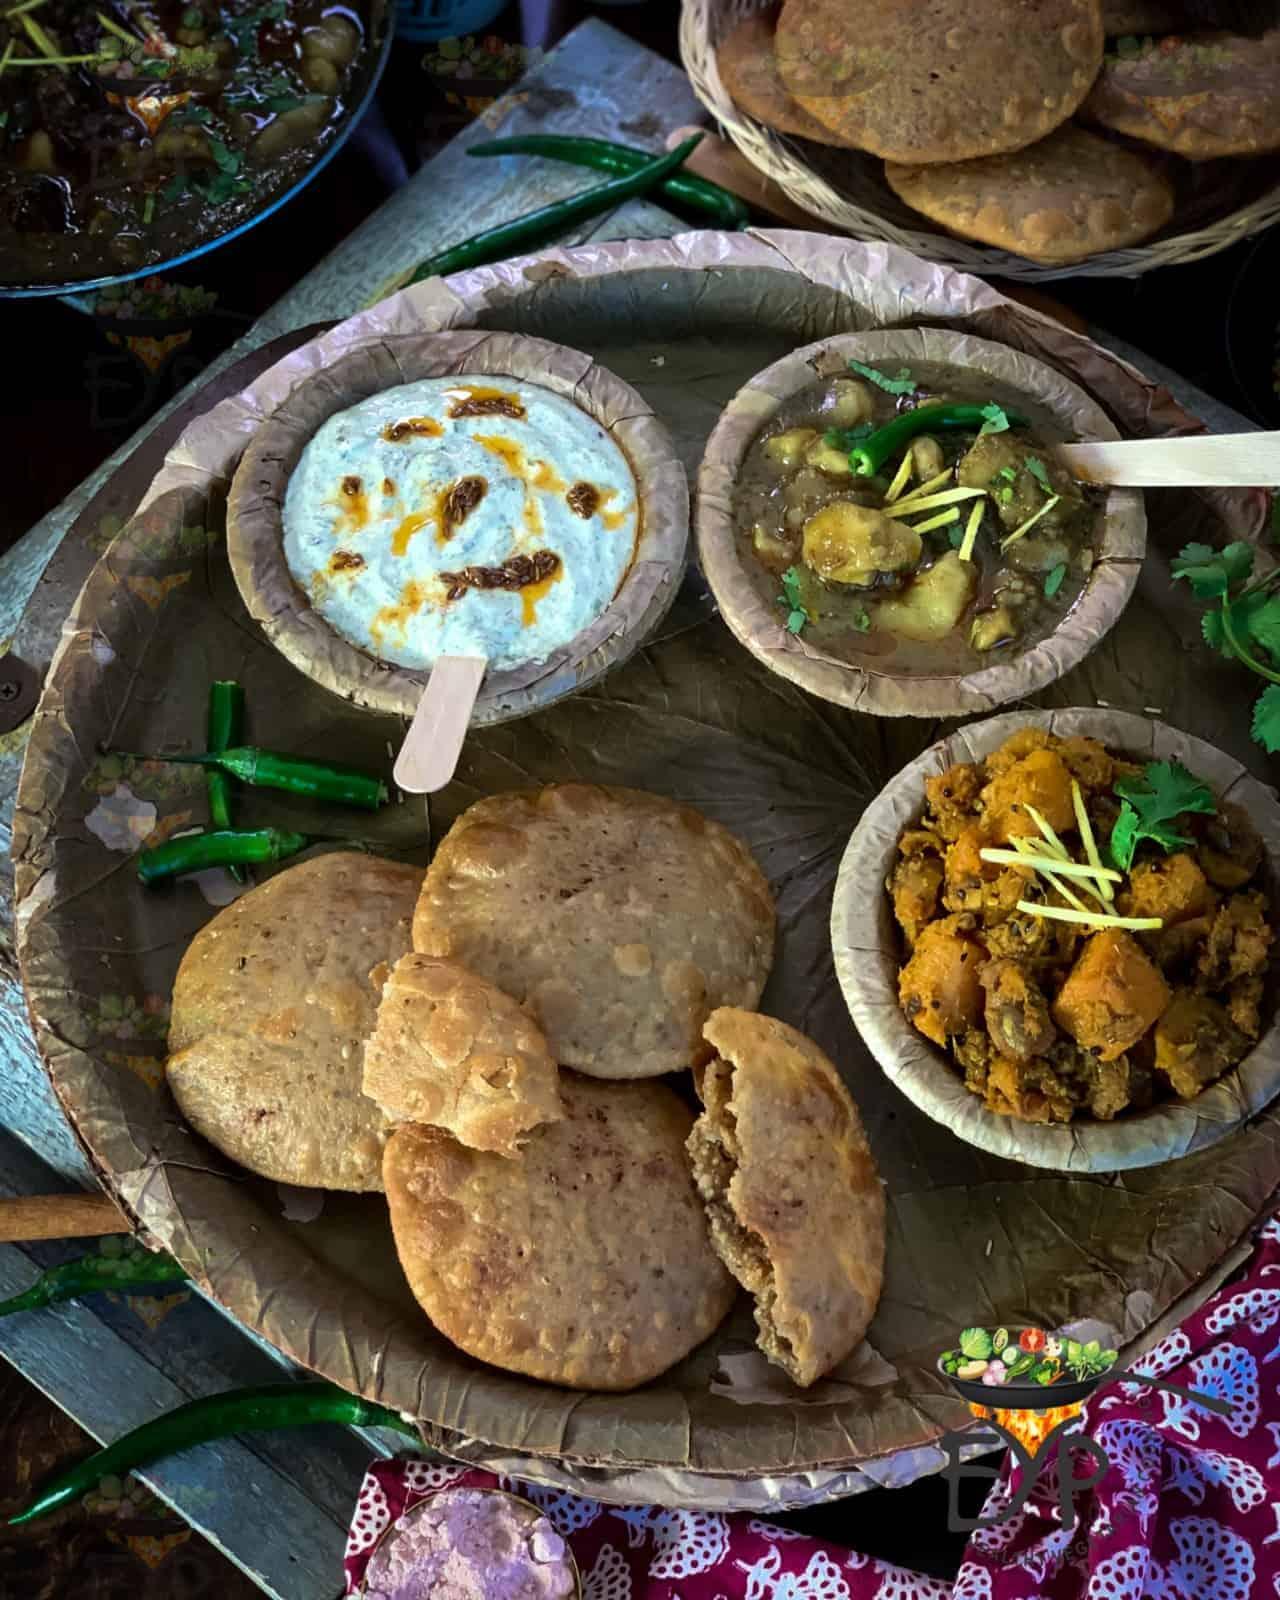 Bedai served with Dubki wale aloo